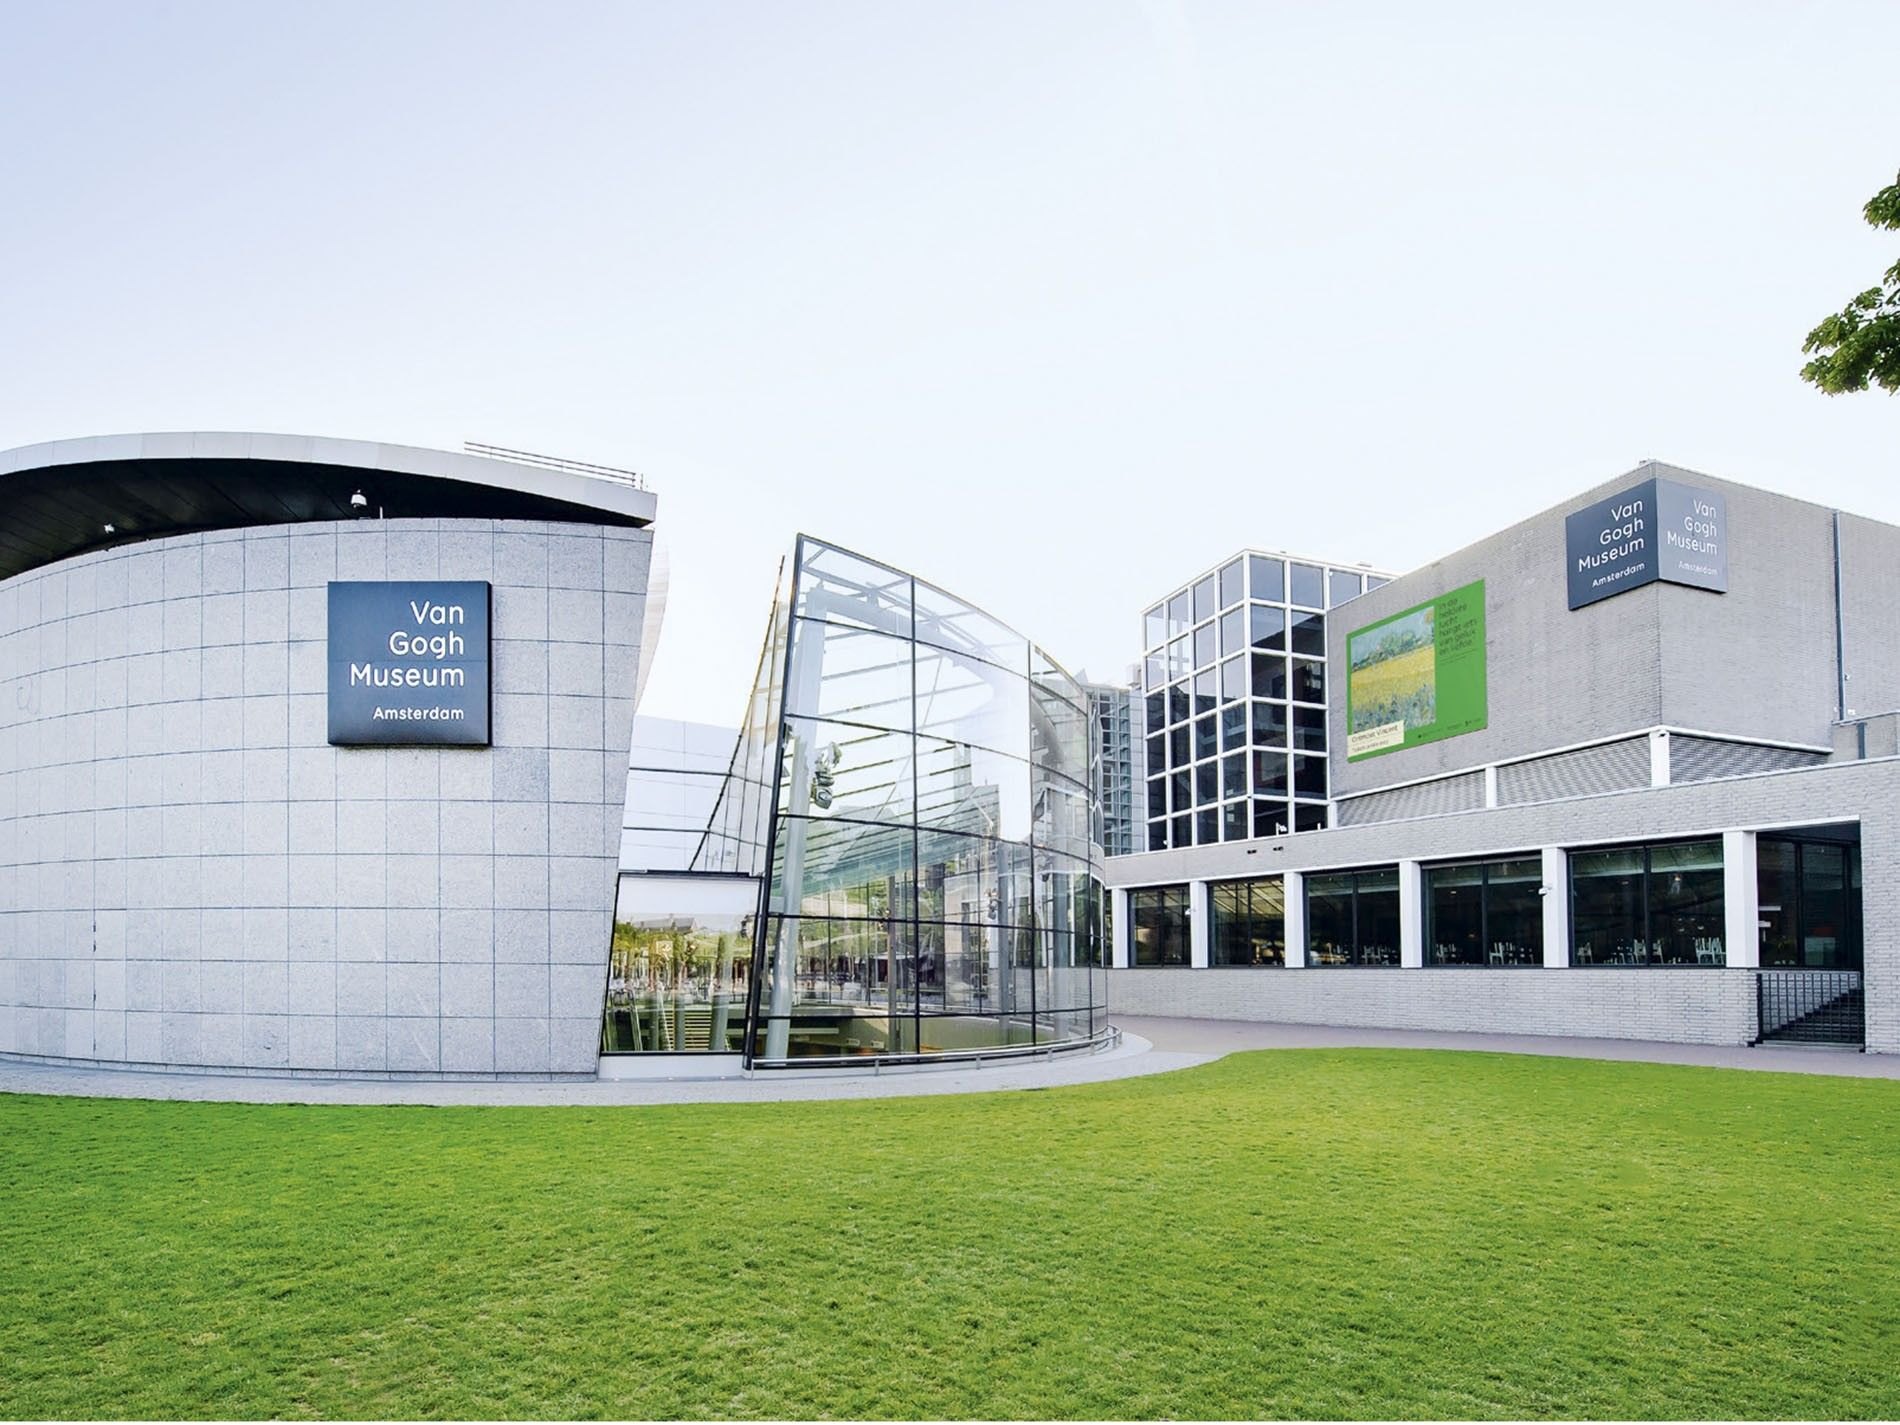 Van Gogh Museum Building